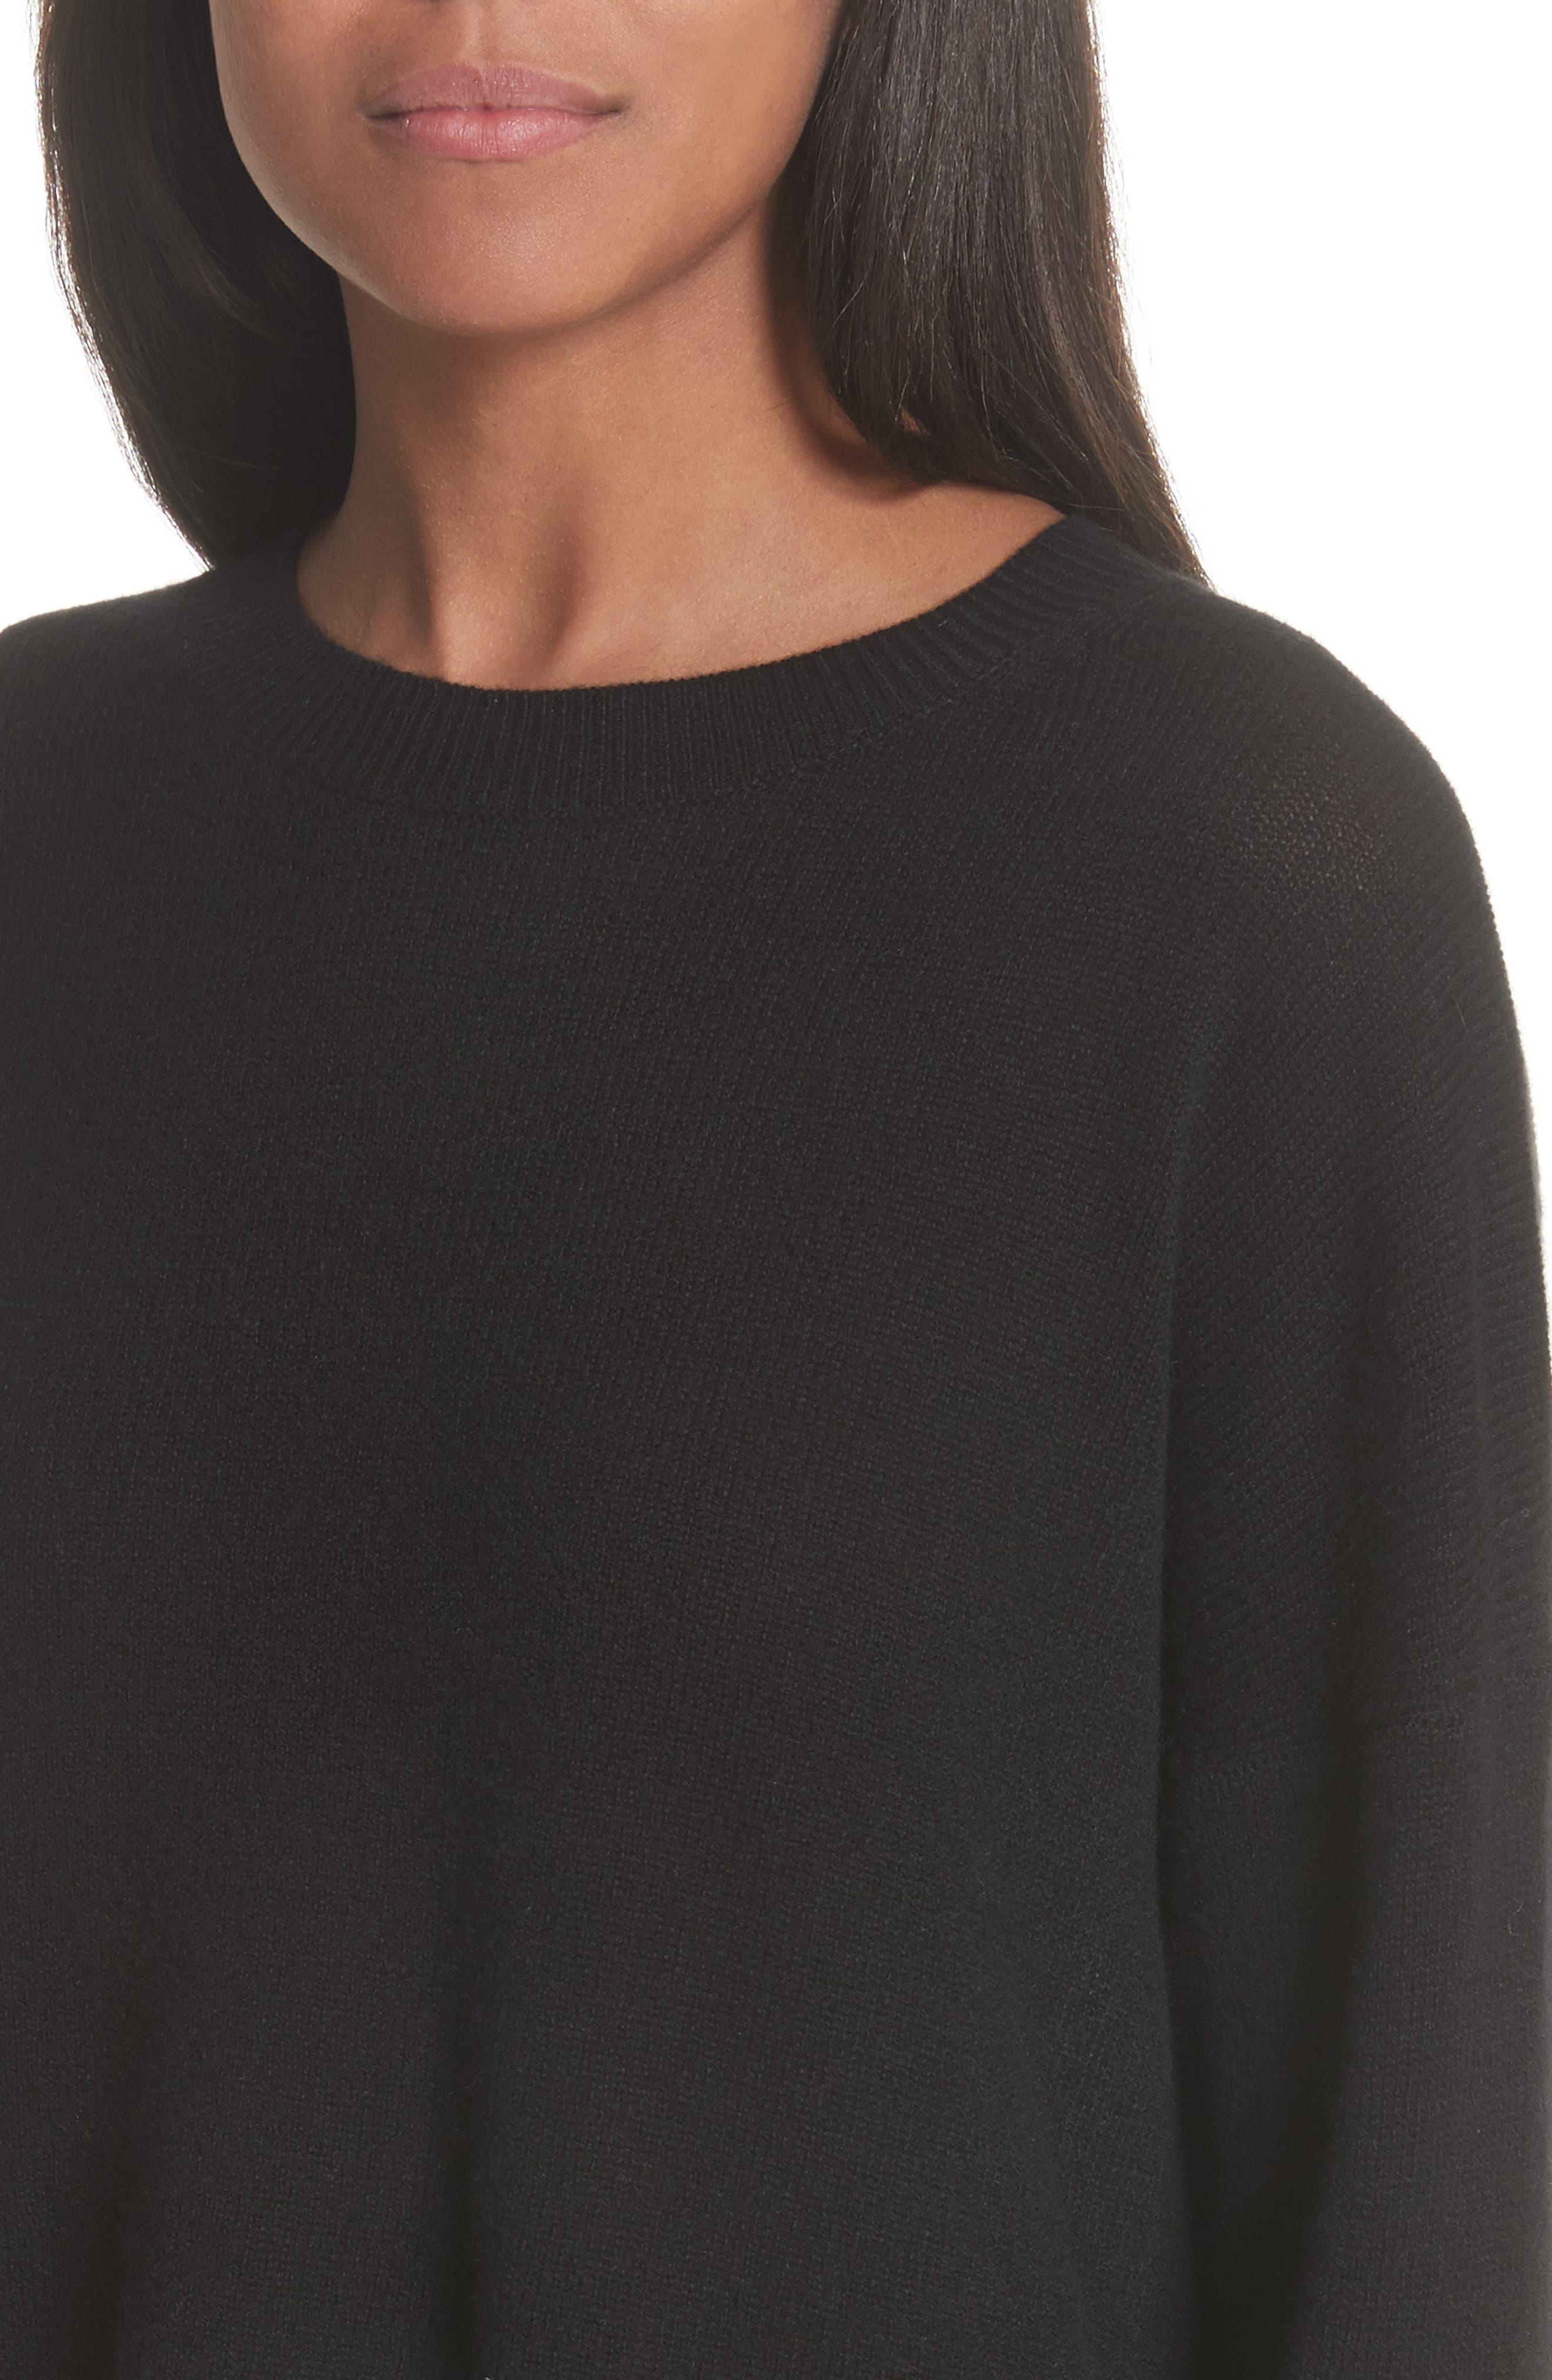 THEORY,                             Karenia L Cashmere Sweater,                             Alternate thumbnail 4, color,                             001